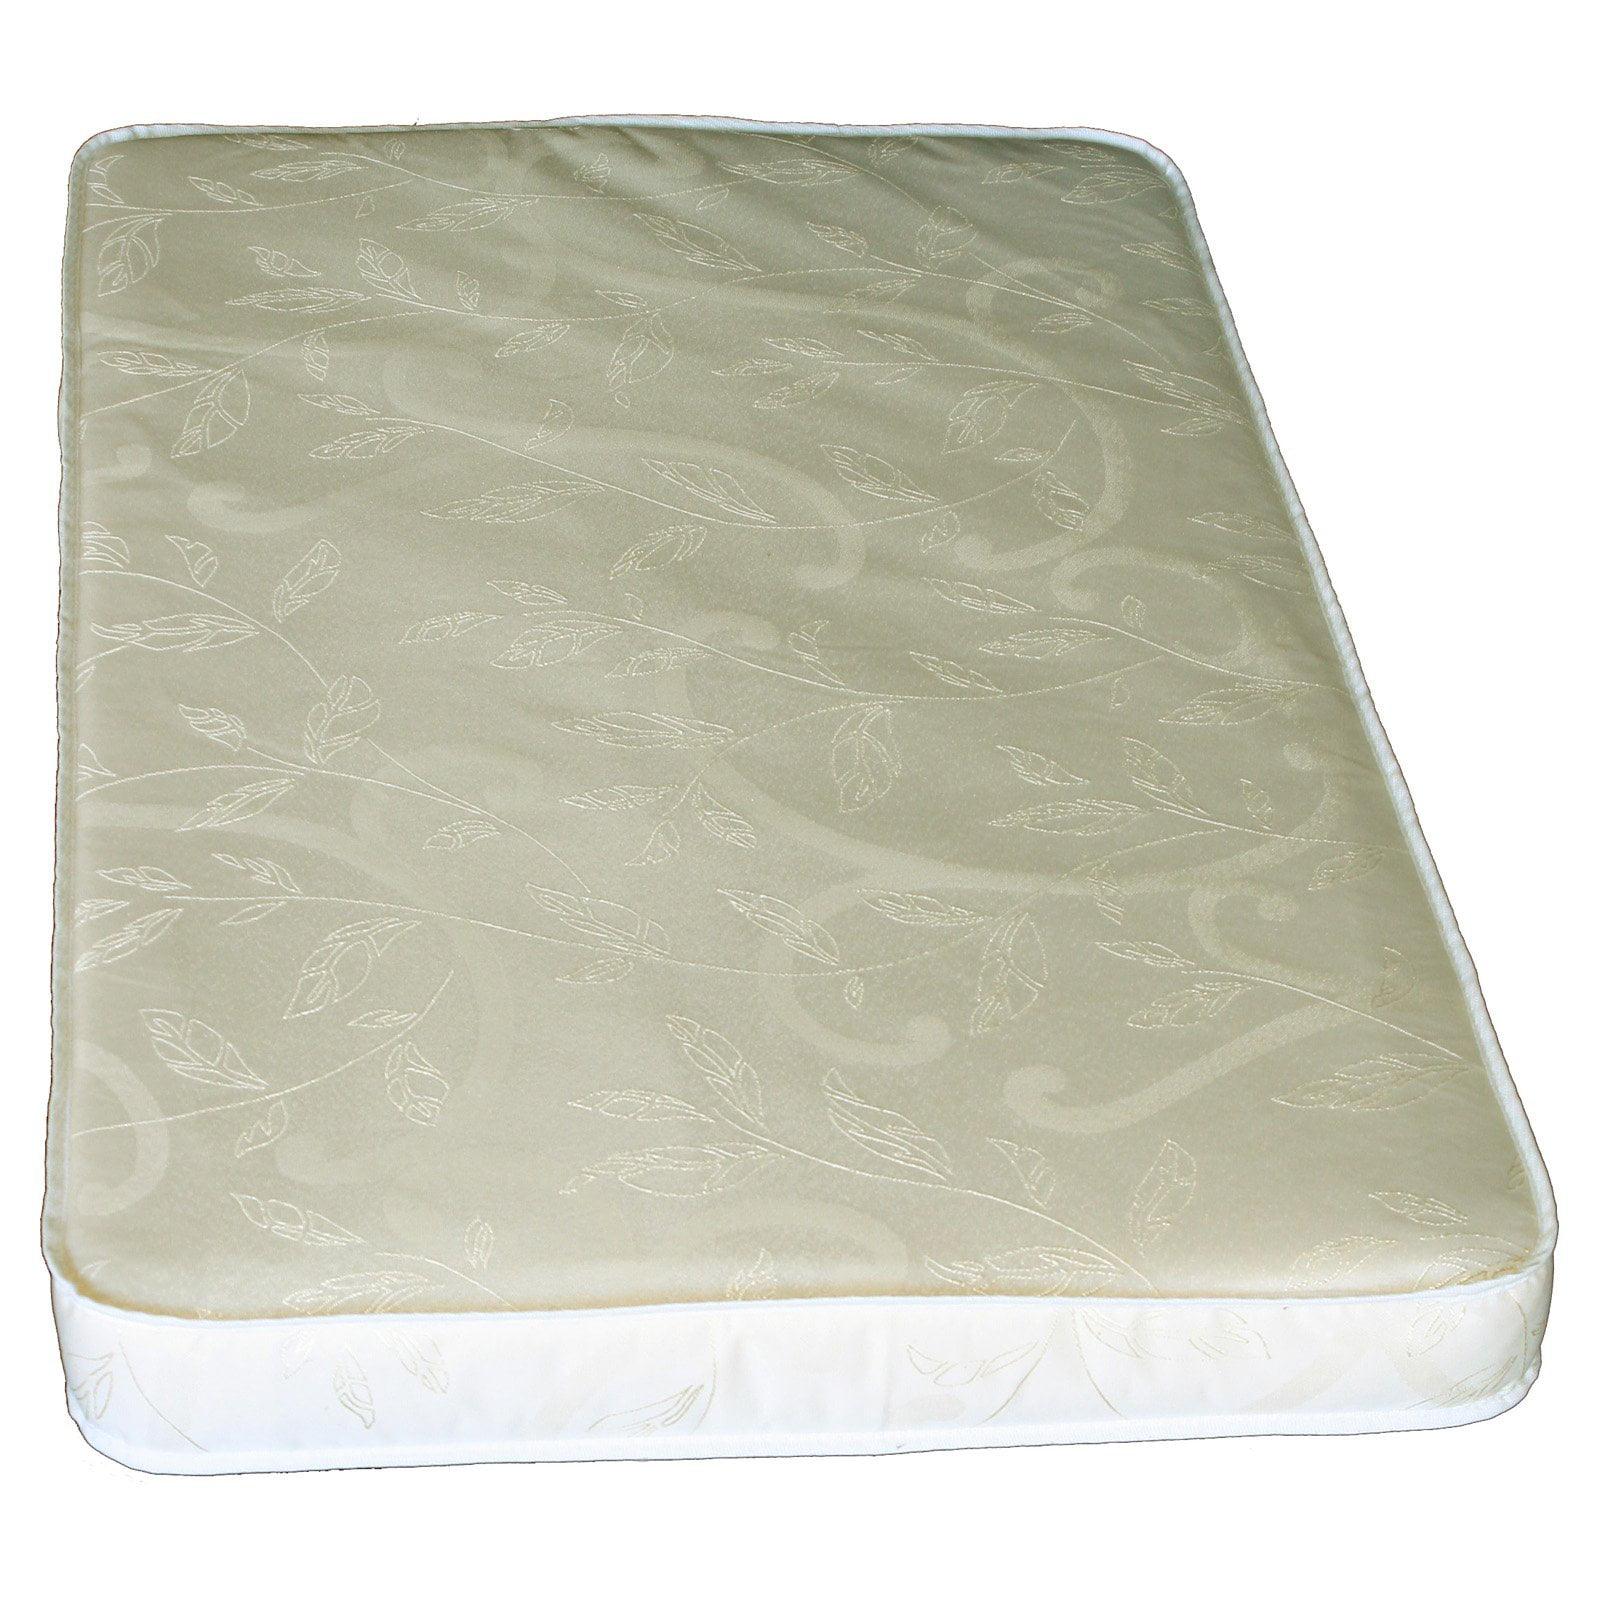 Colgate EcoPad Eco-Friendlier 3 in. Portable Crib Mattress